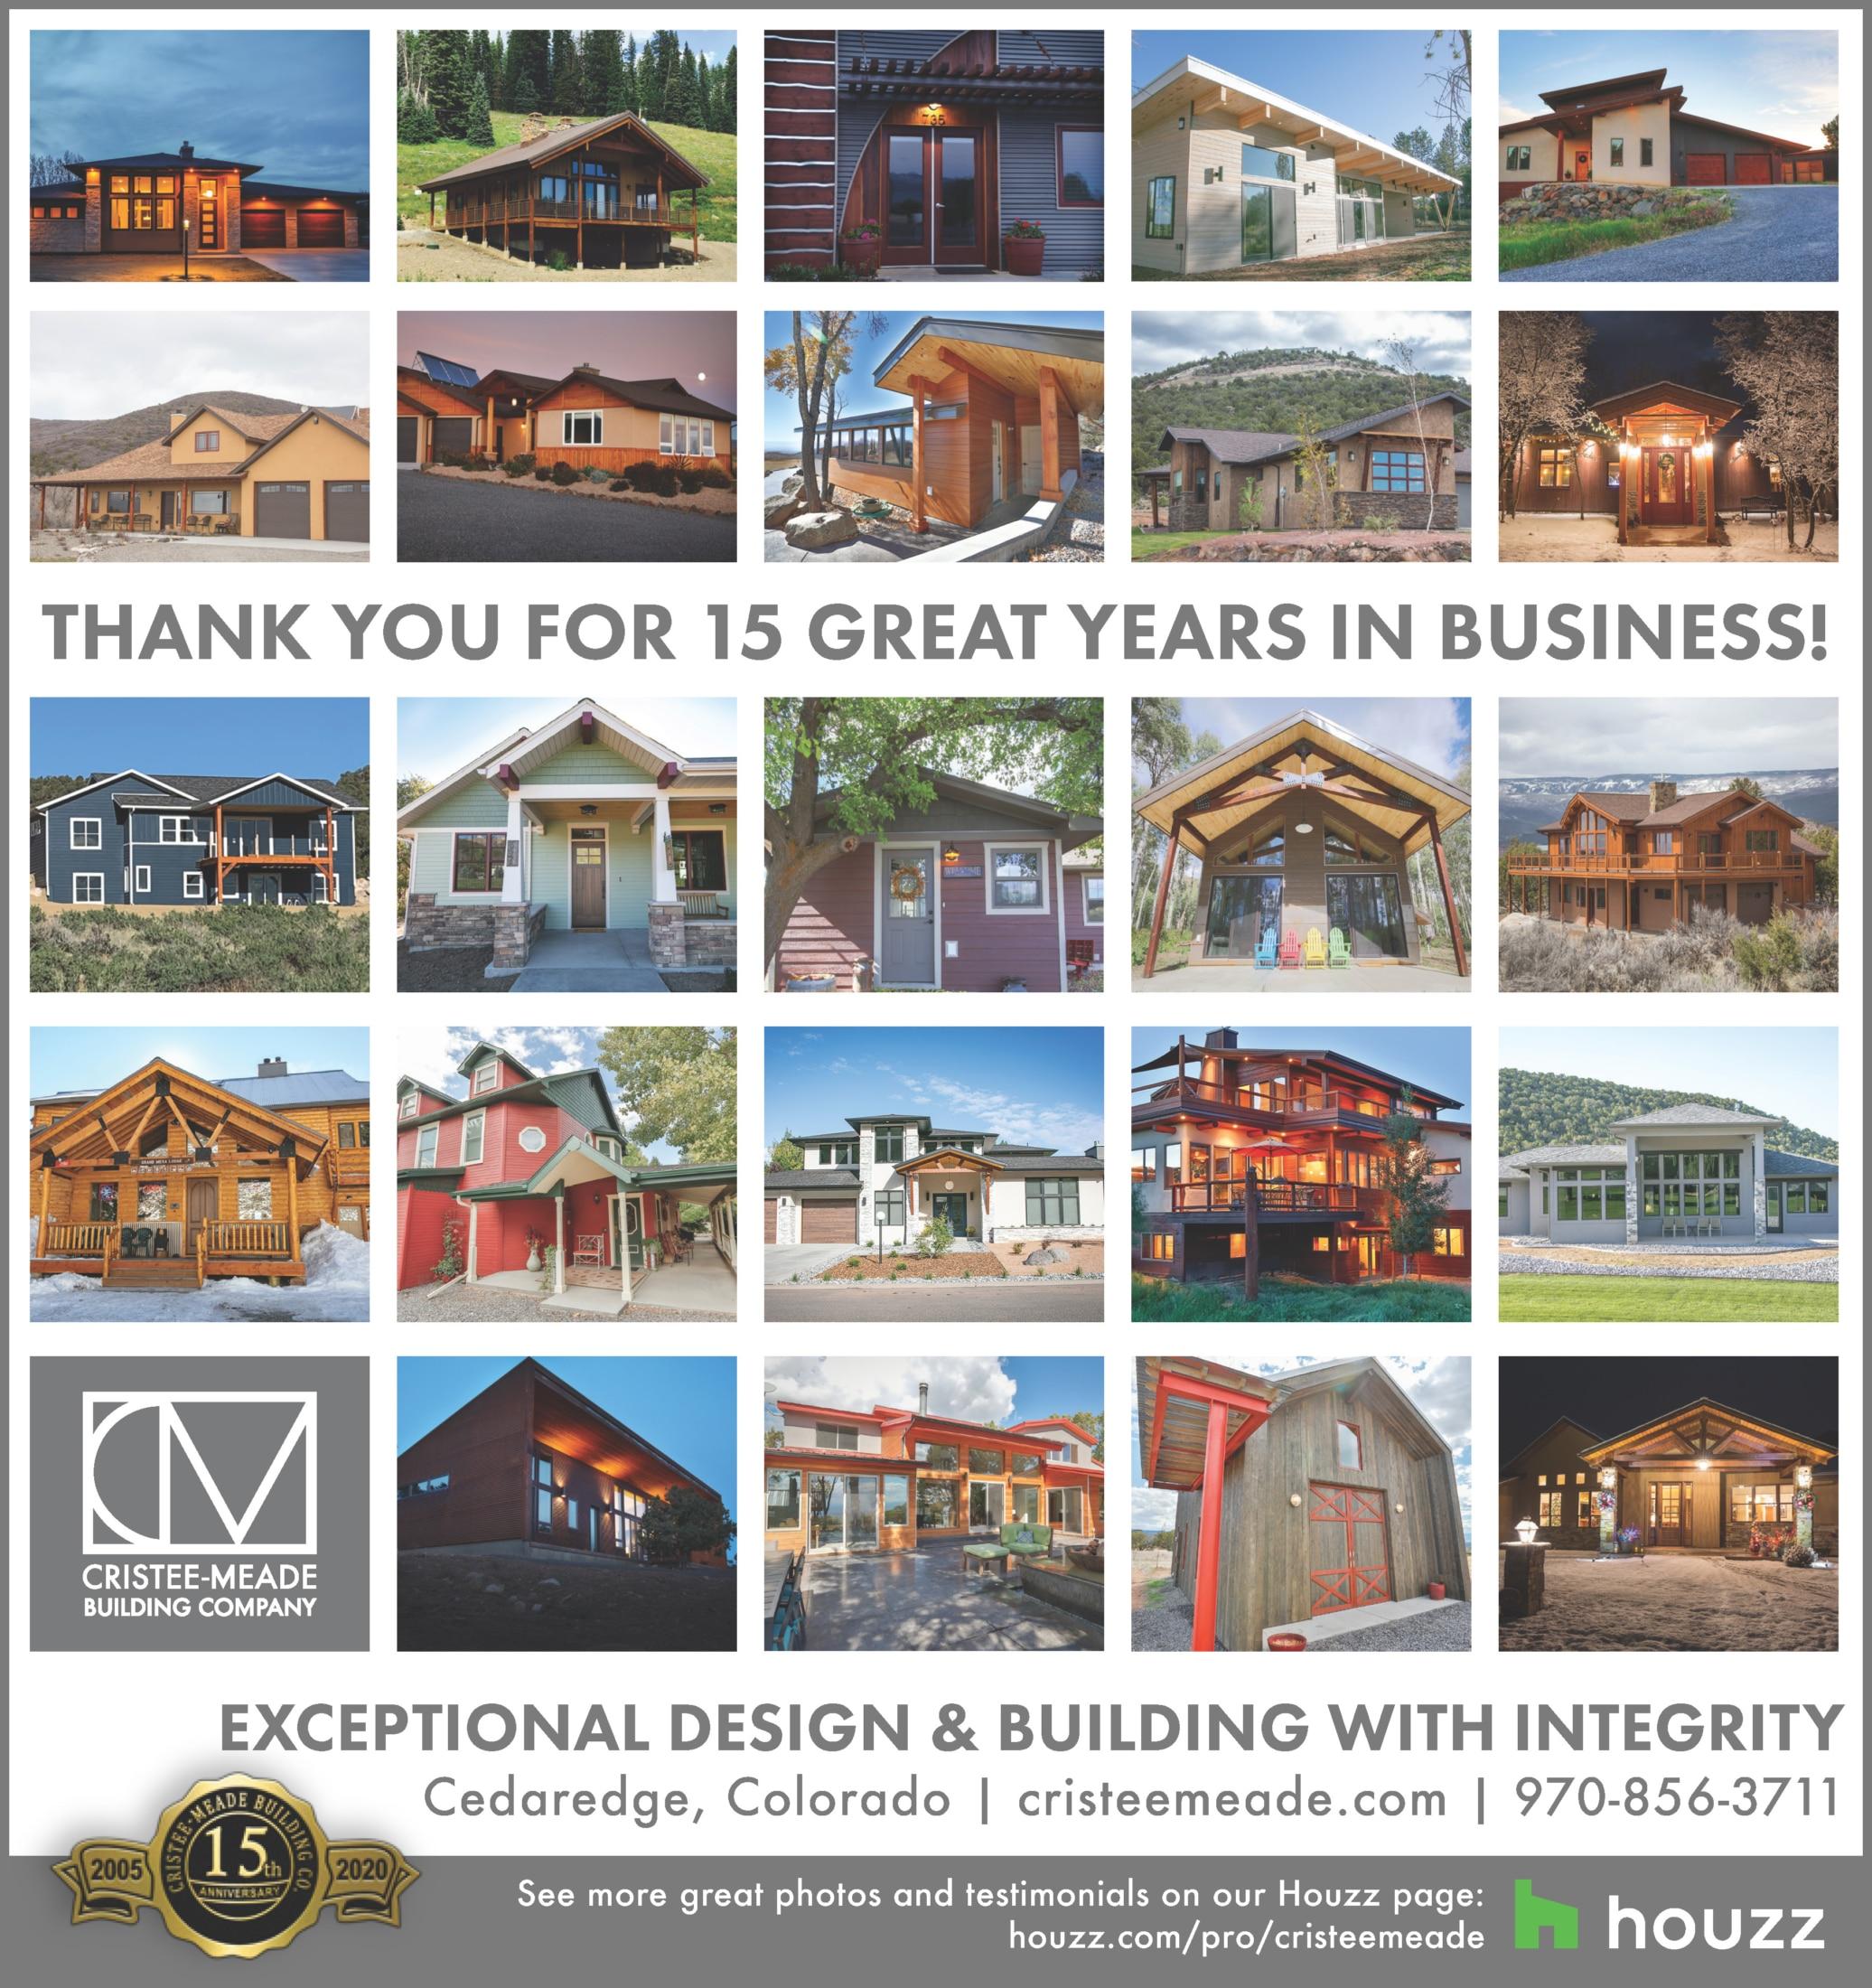 Cristee-Meade Building Company Celebrates 15th Anniversary